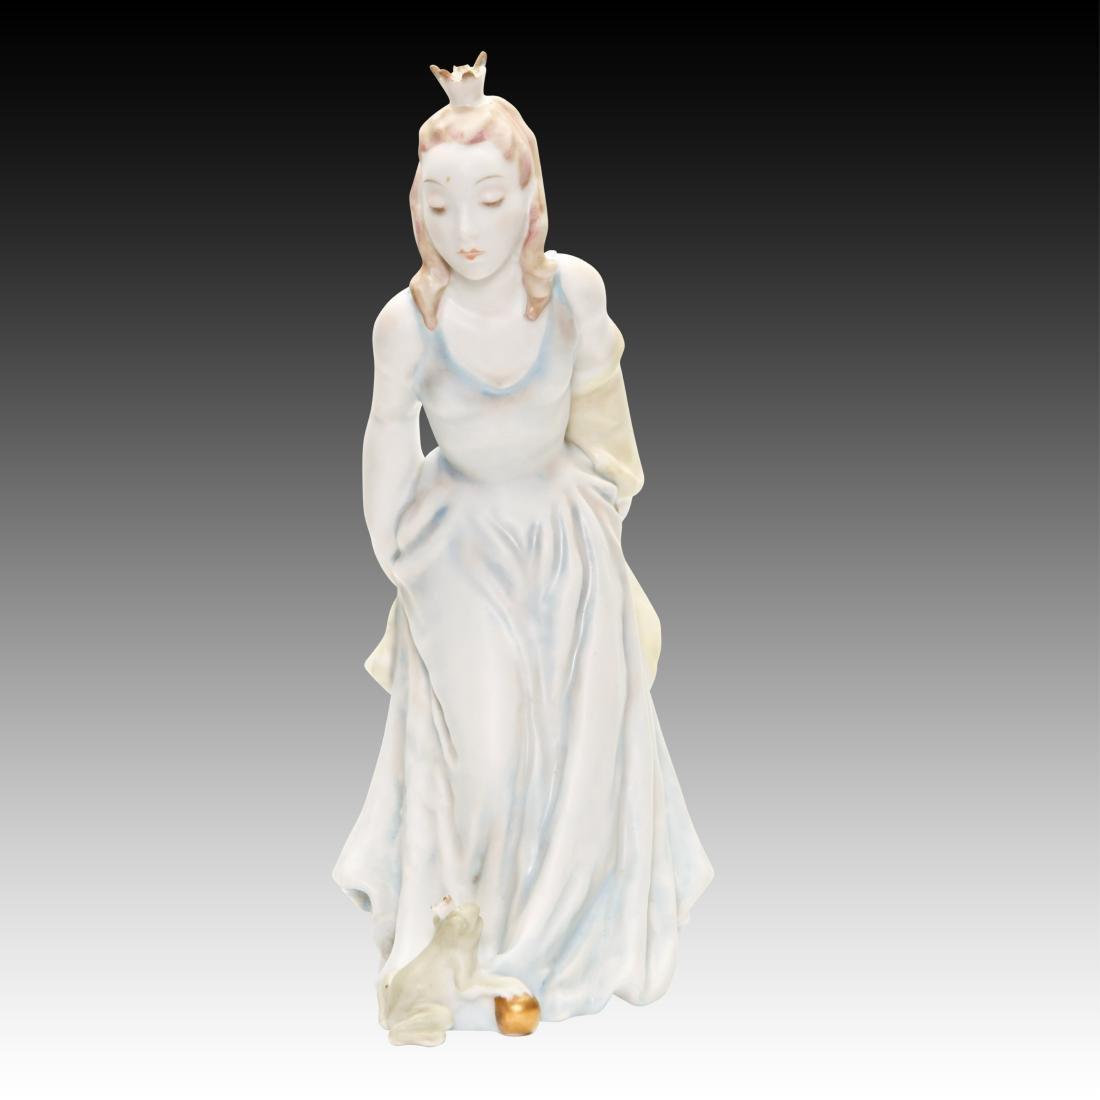 Rosenthal Figurine Princess and the Frog #1